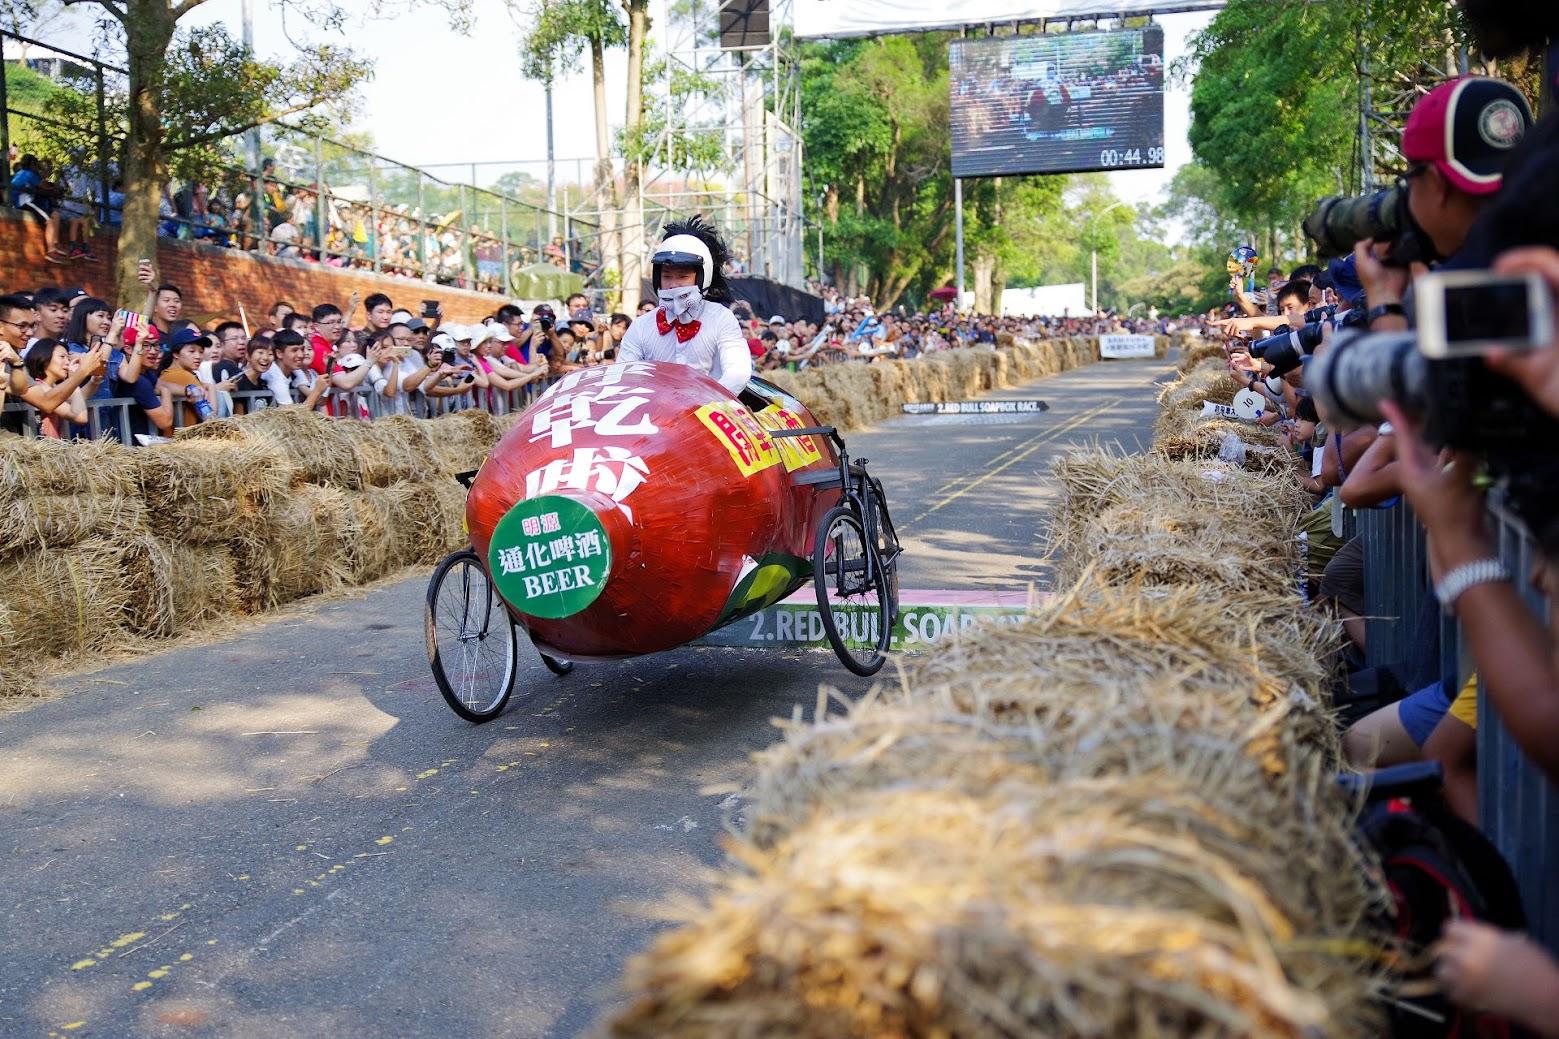 2017台灣皂飛車 Red Bull Soapbox Race in Taiwan